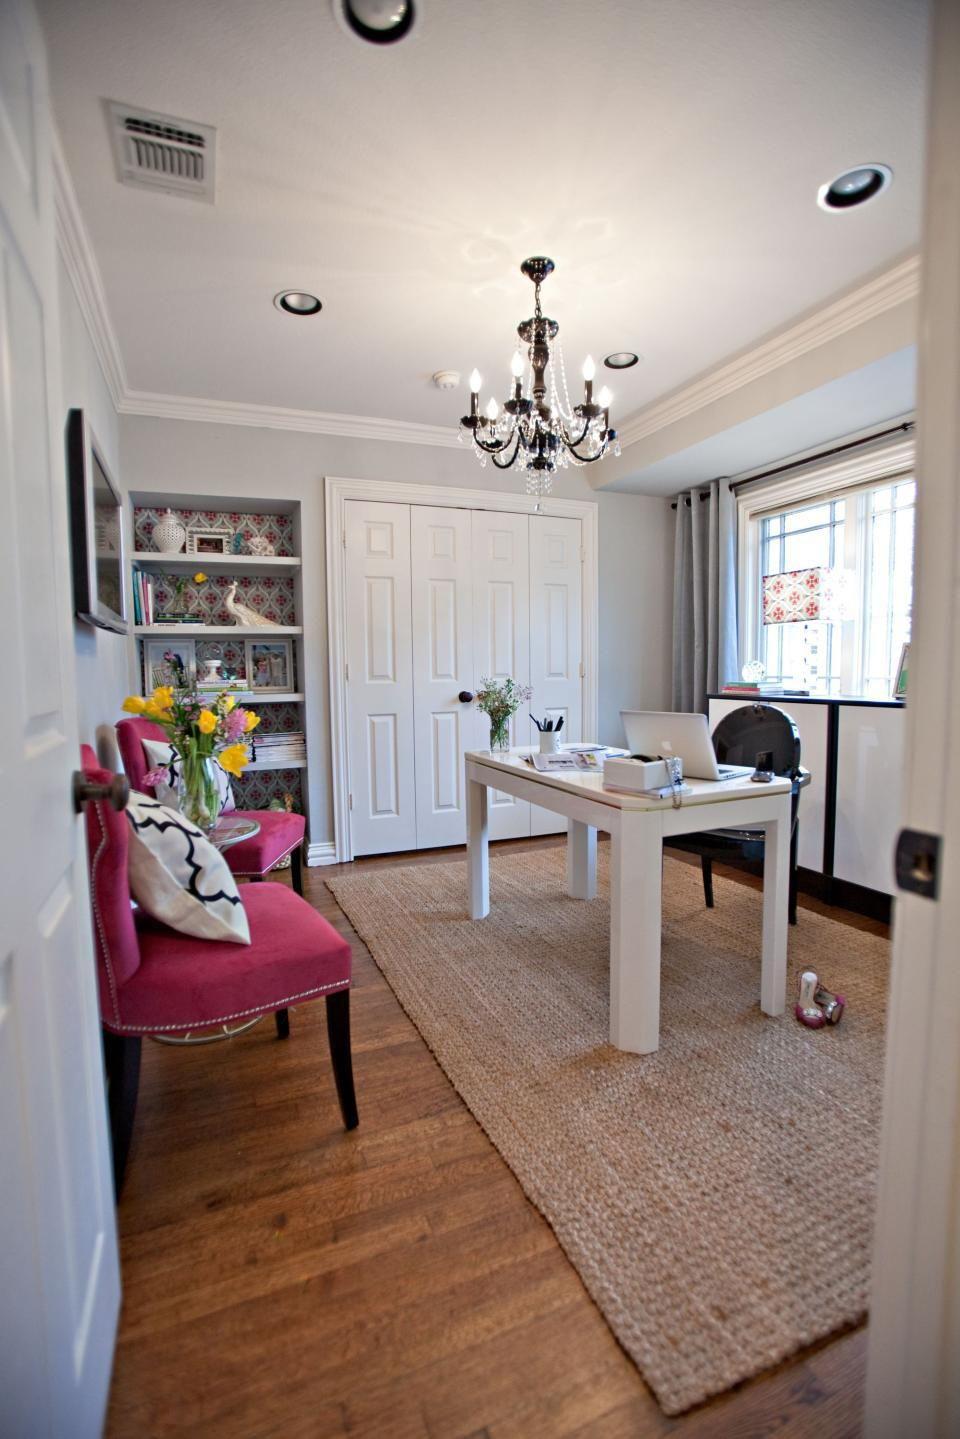 Office space but with less girly mess | Casa de Schrum\'s | Pinterest